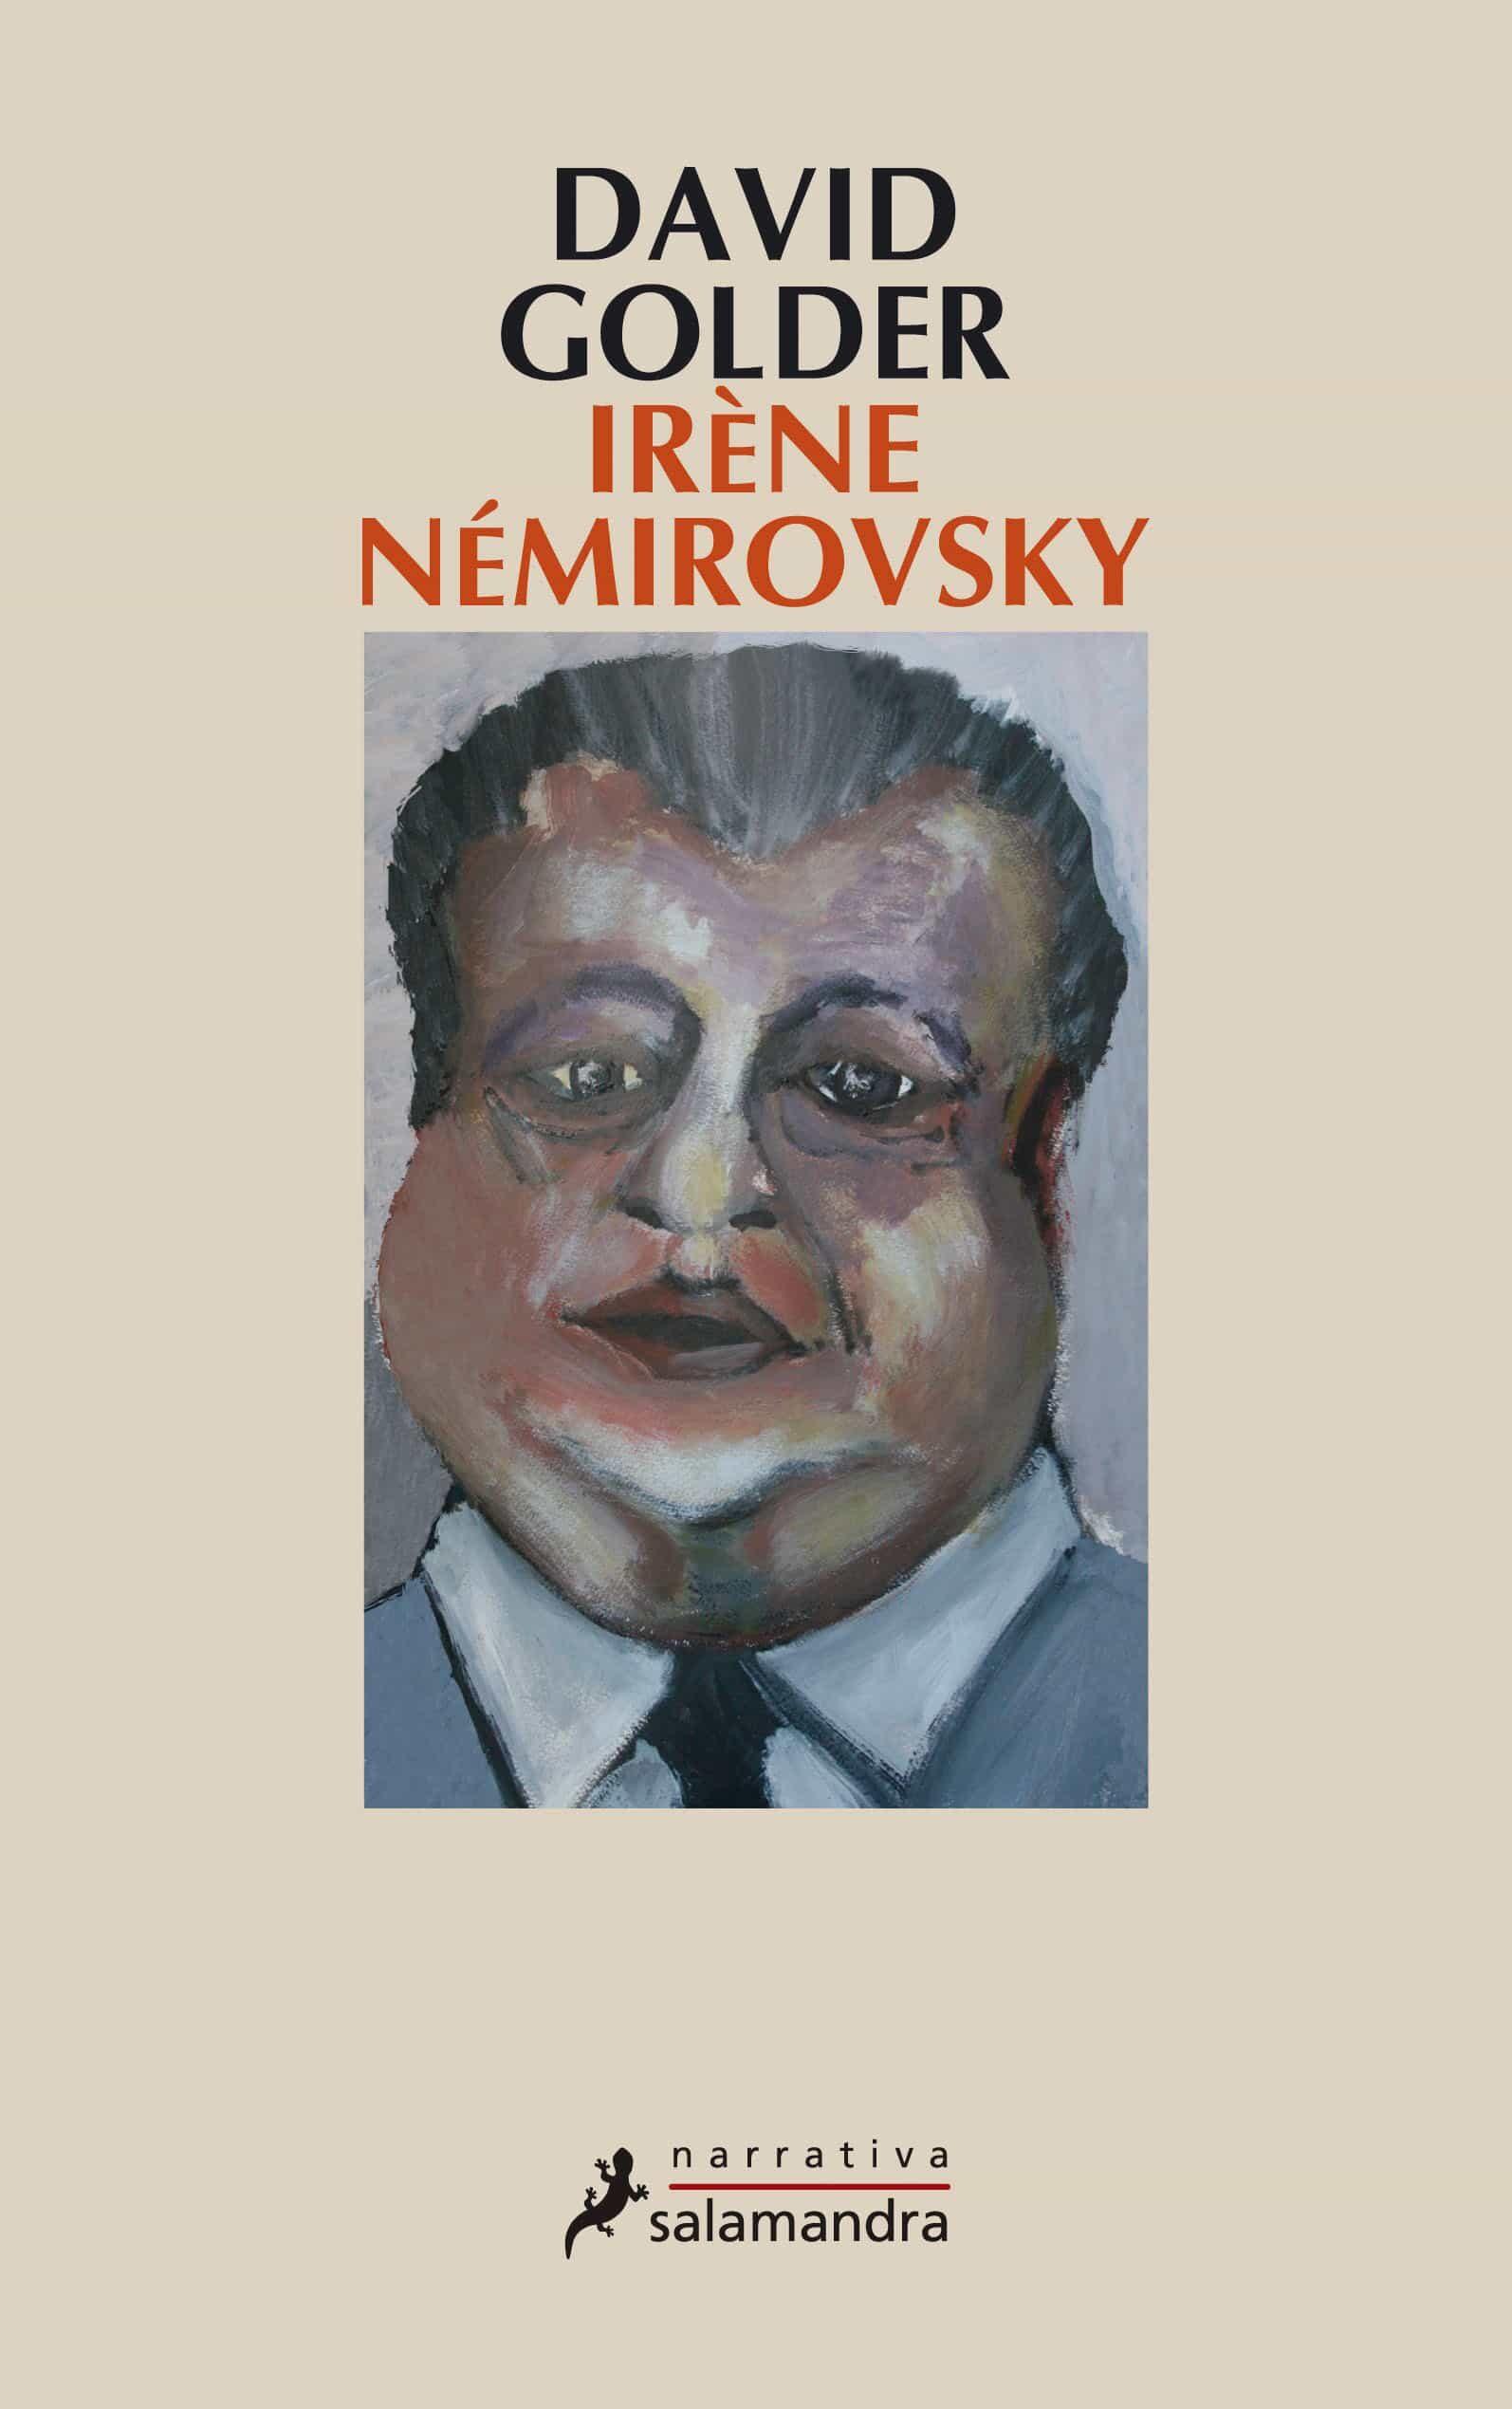 David Golder - Nemirovsky Irene